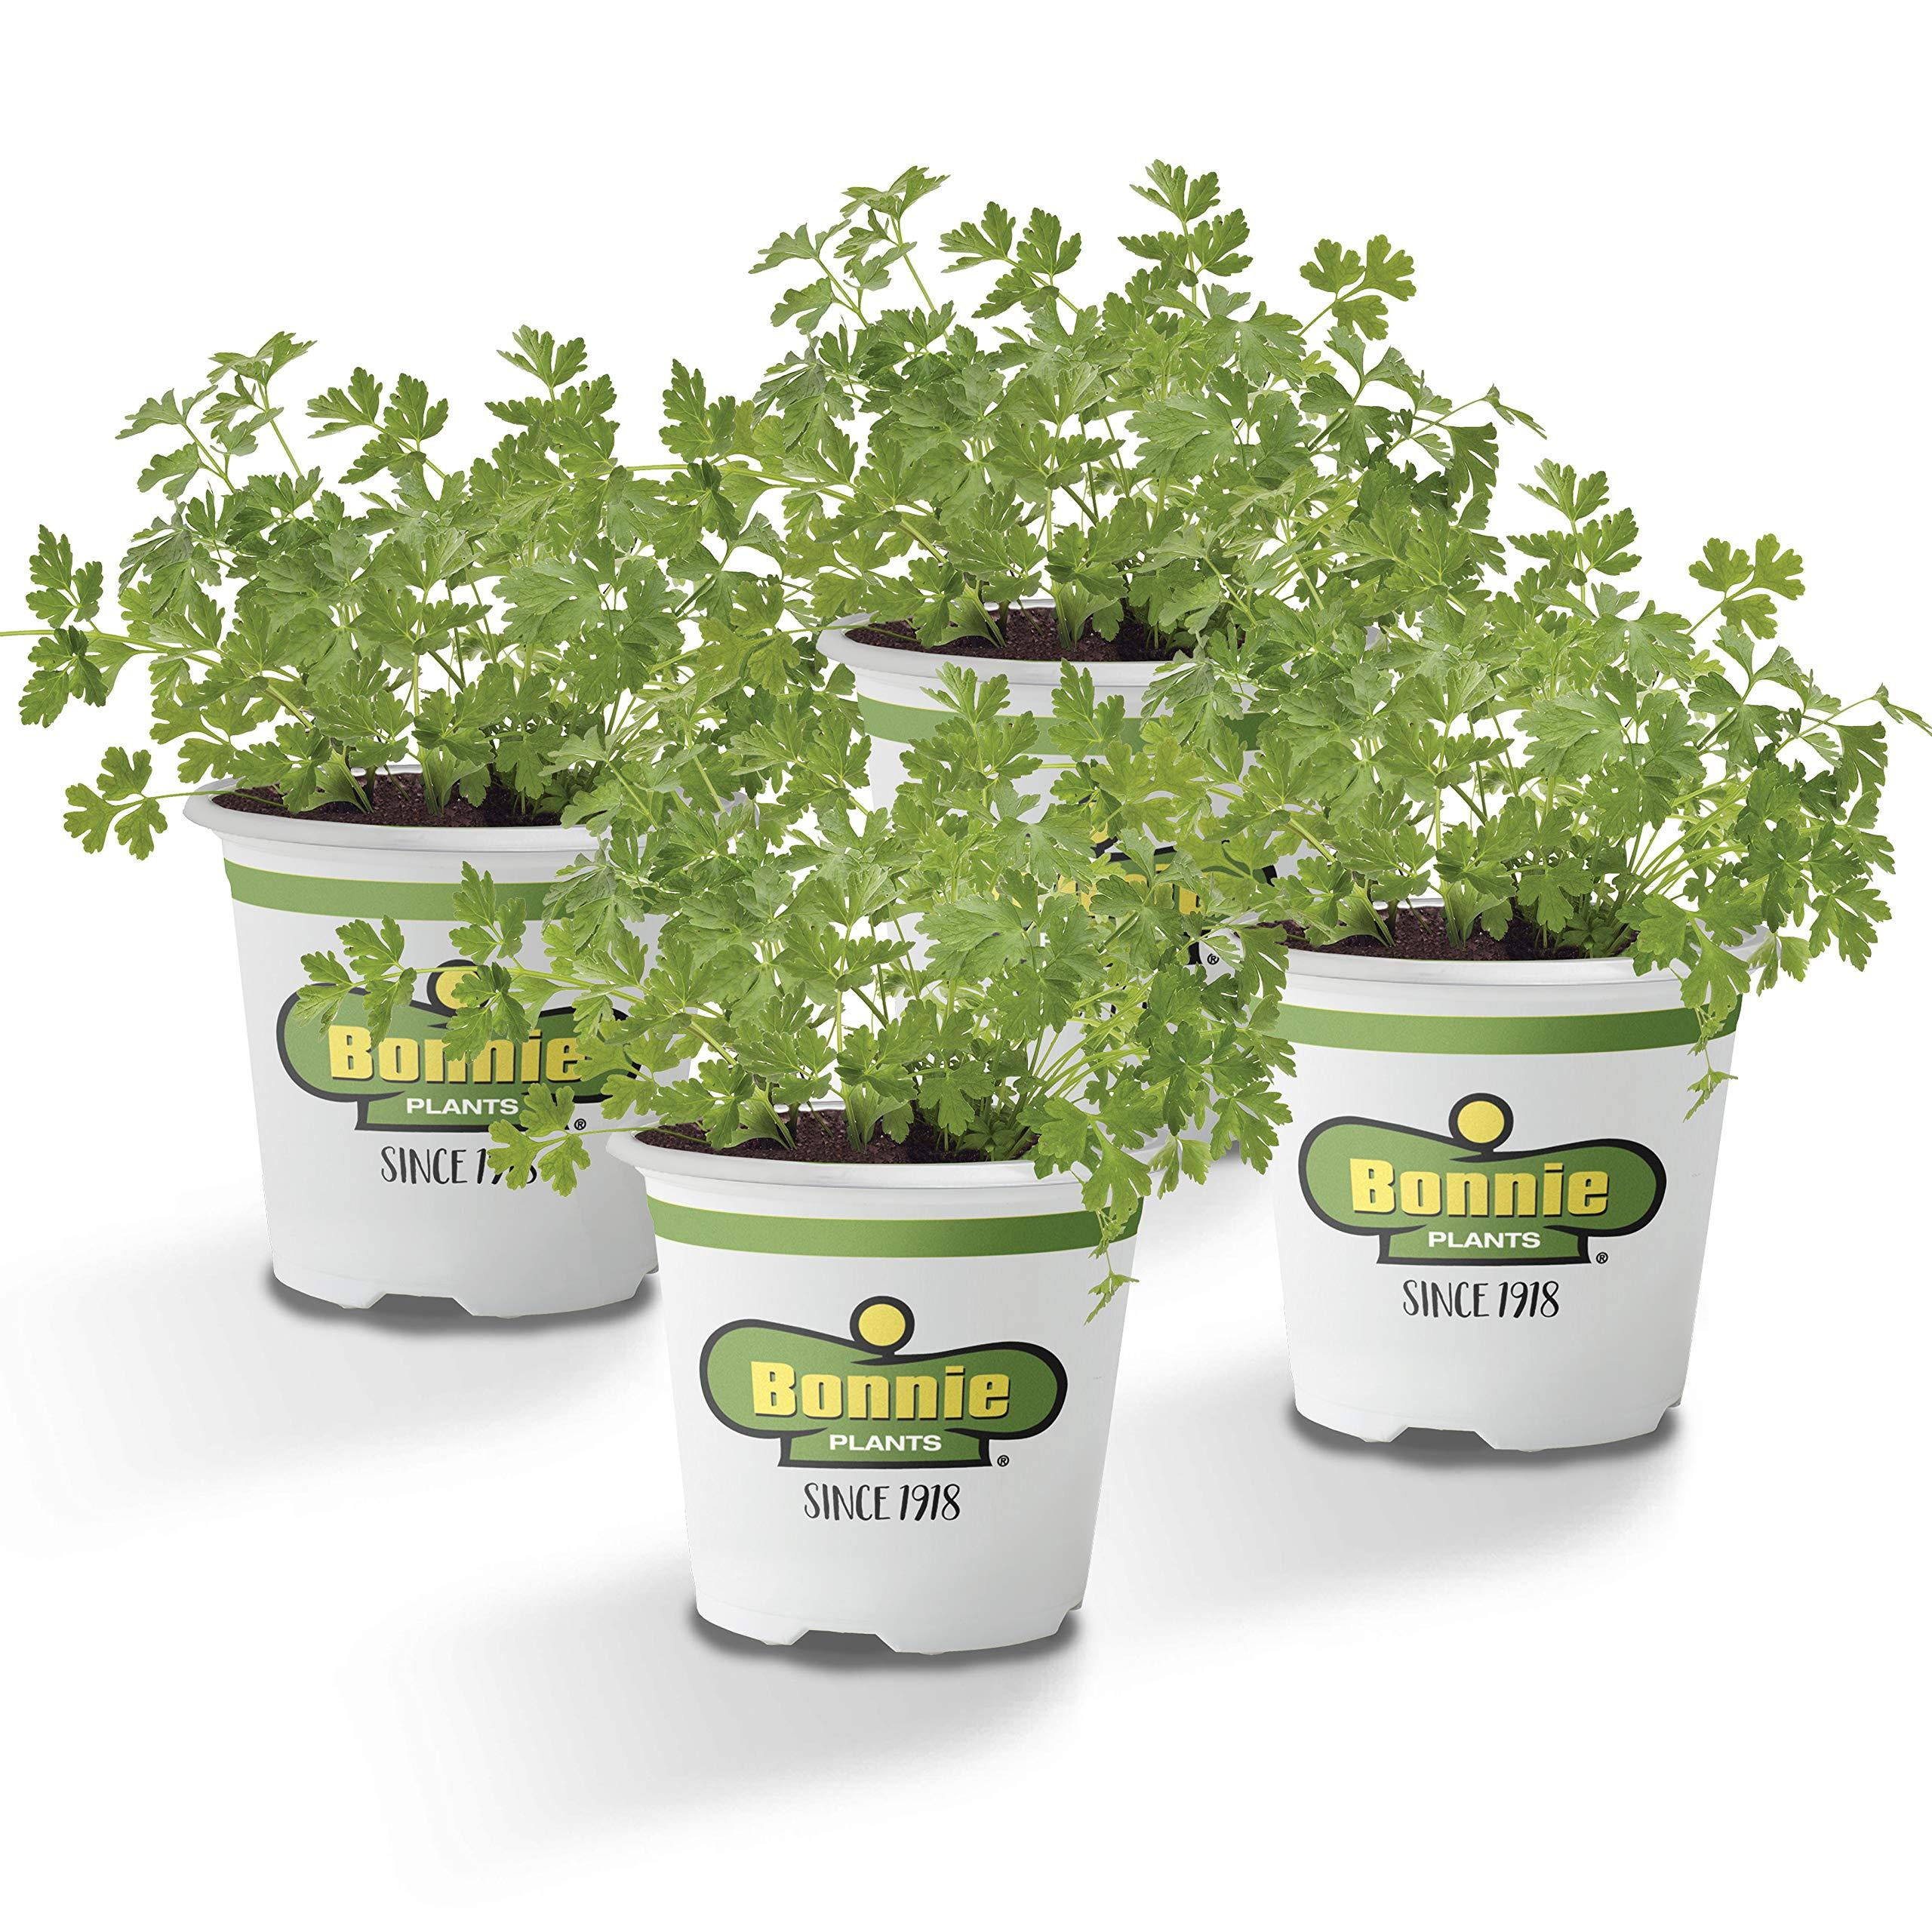 Bonnie Plants Flat Italian Parsley Live Herb Plants - 4 Pack | Biennial | Non-GMO | Garnish, Seasoning, Salads, Palate Cleanser